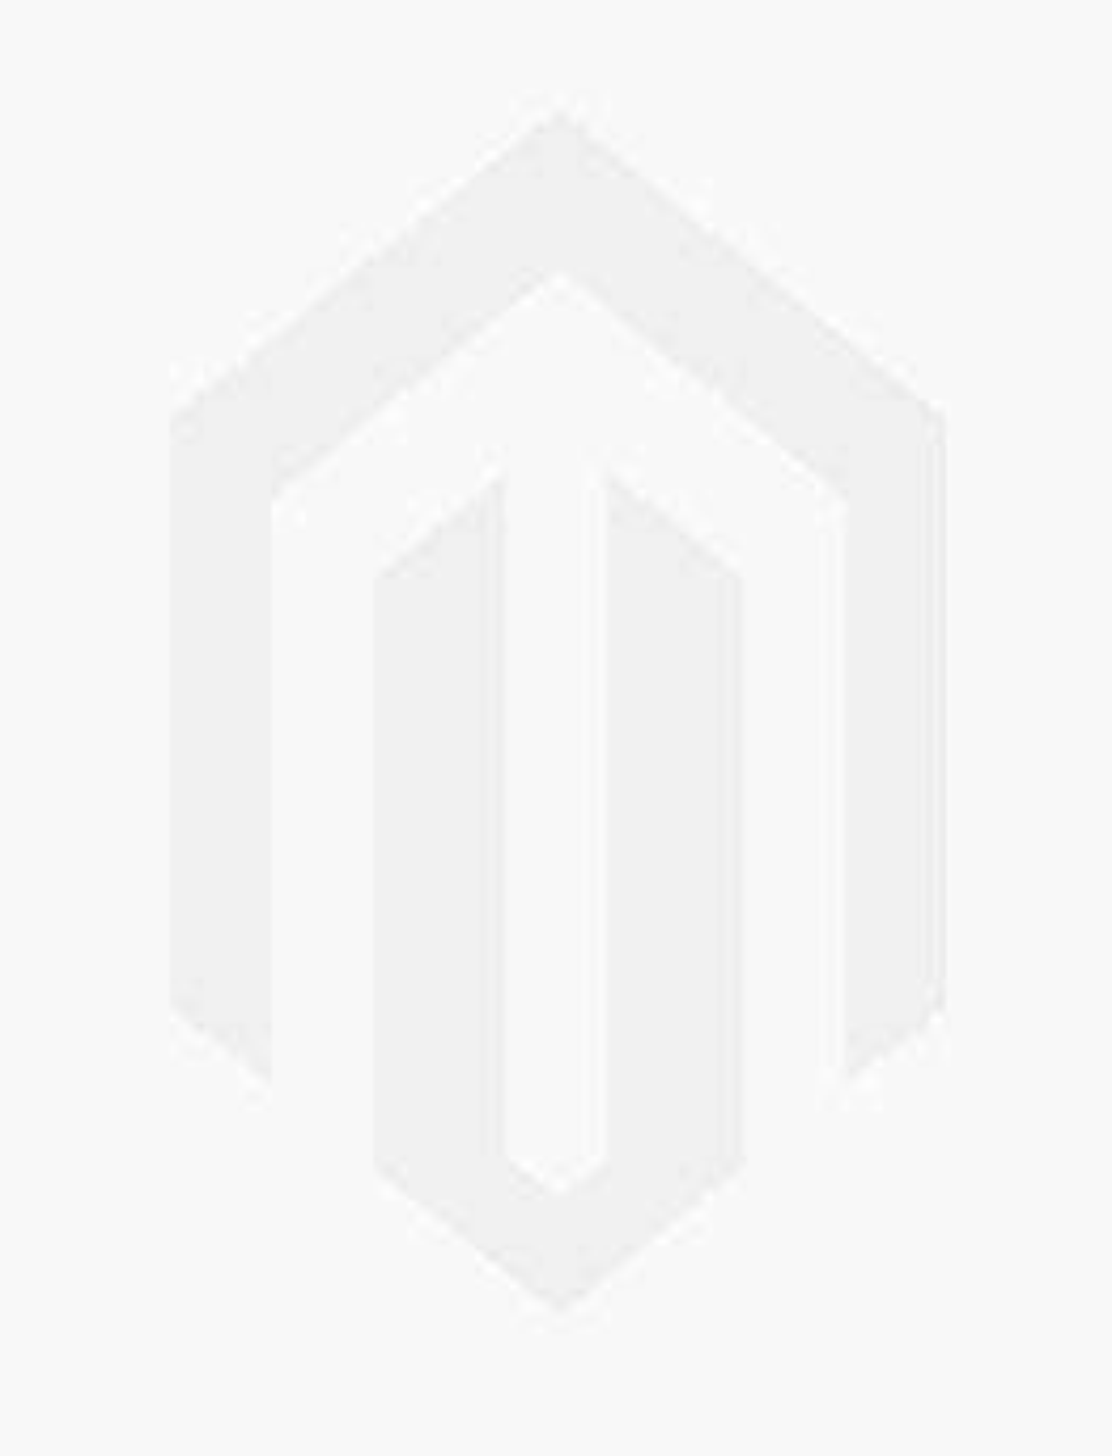 Short Pendulum Charm with Short Spike Image #1